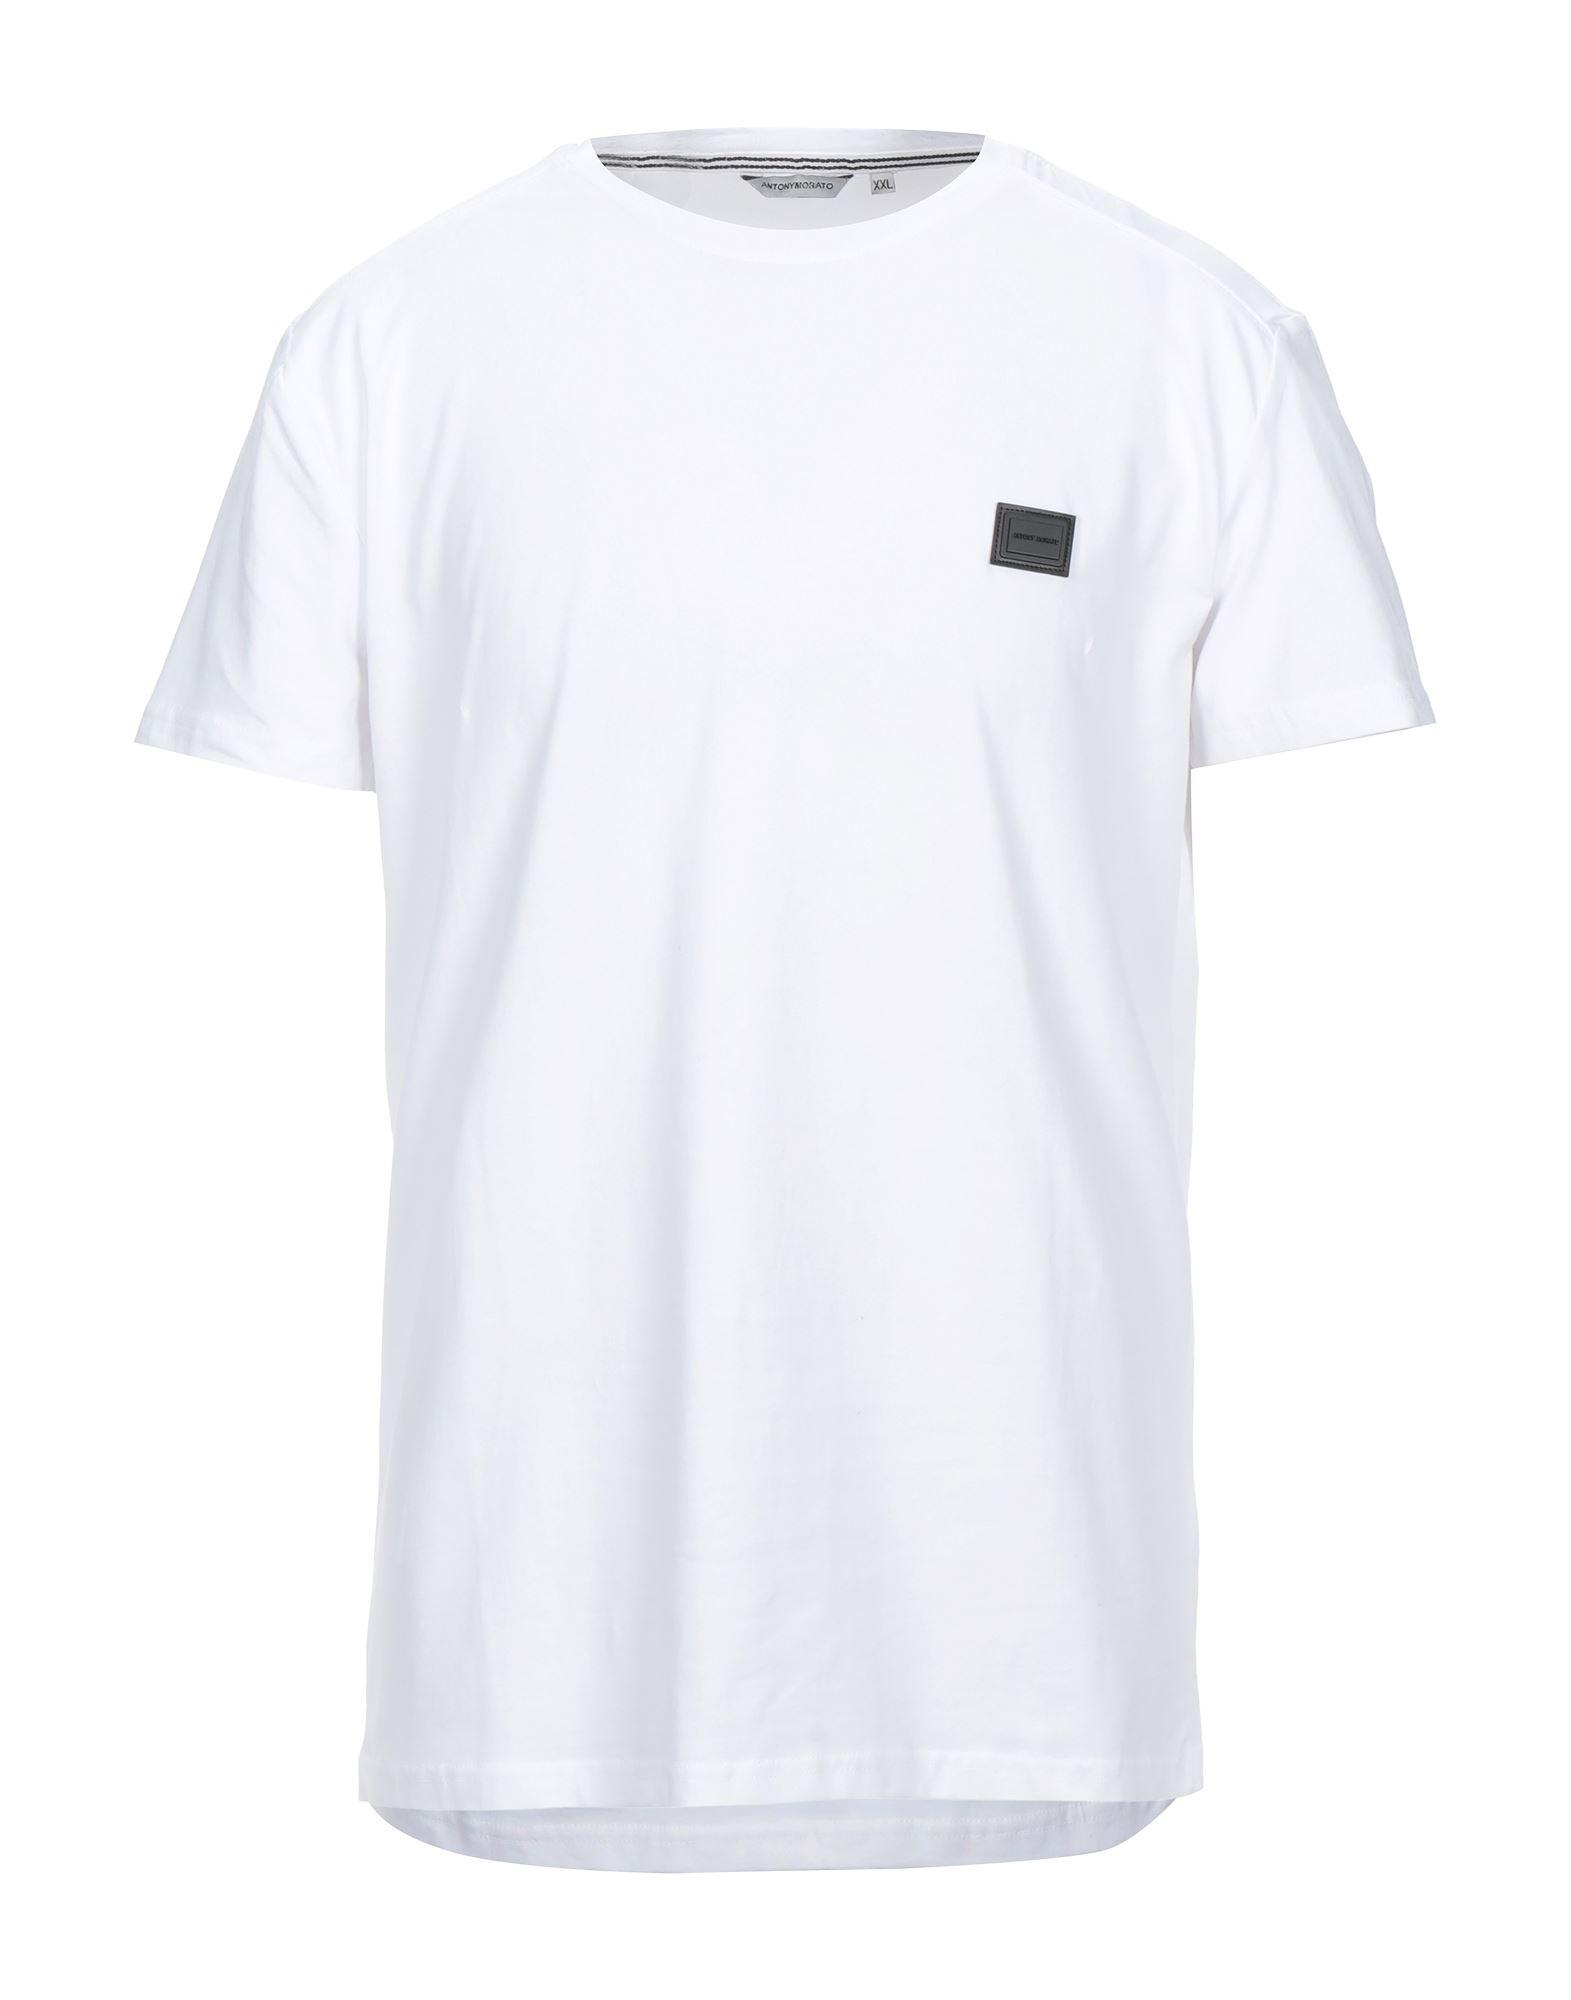 Antony Morato T-shirts In White